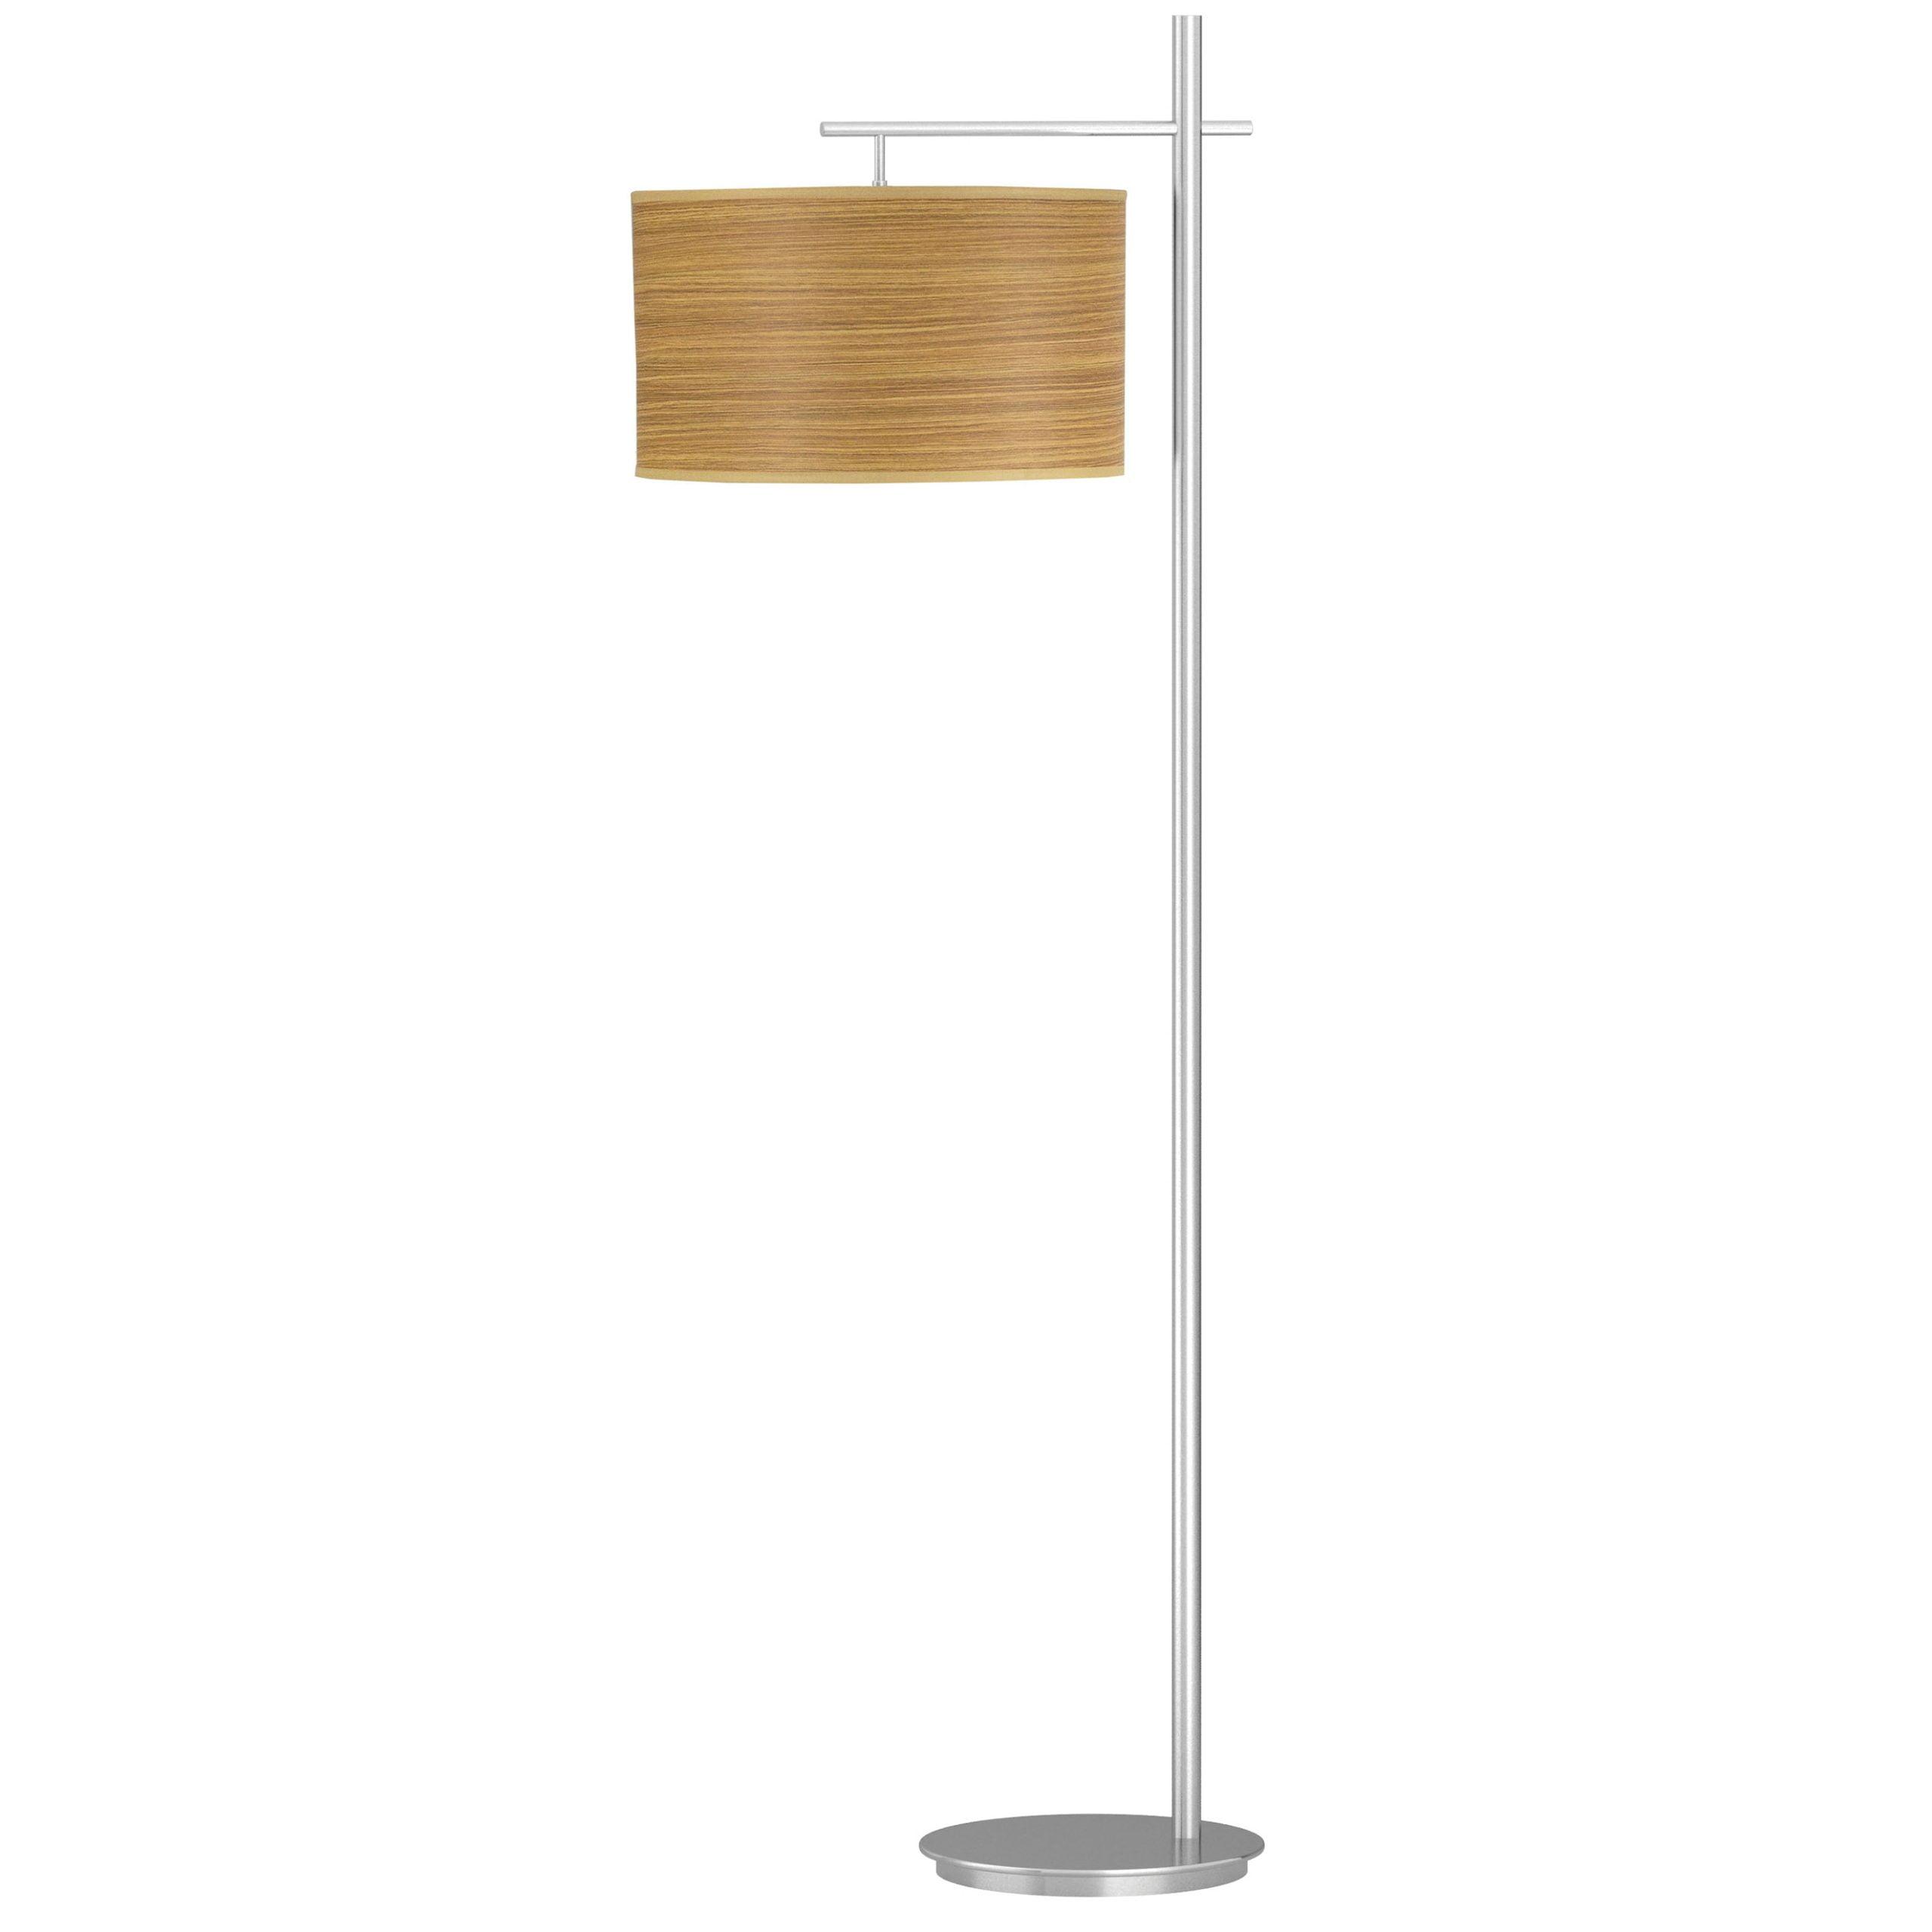 Sleep Floor Lamp with Zebrawood Shade